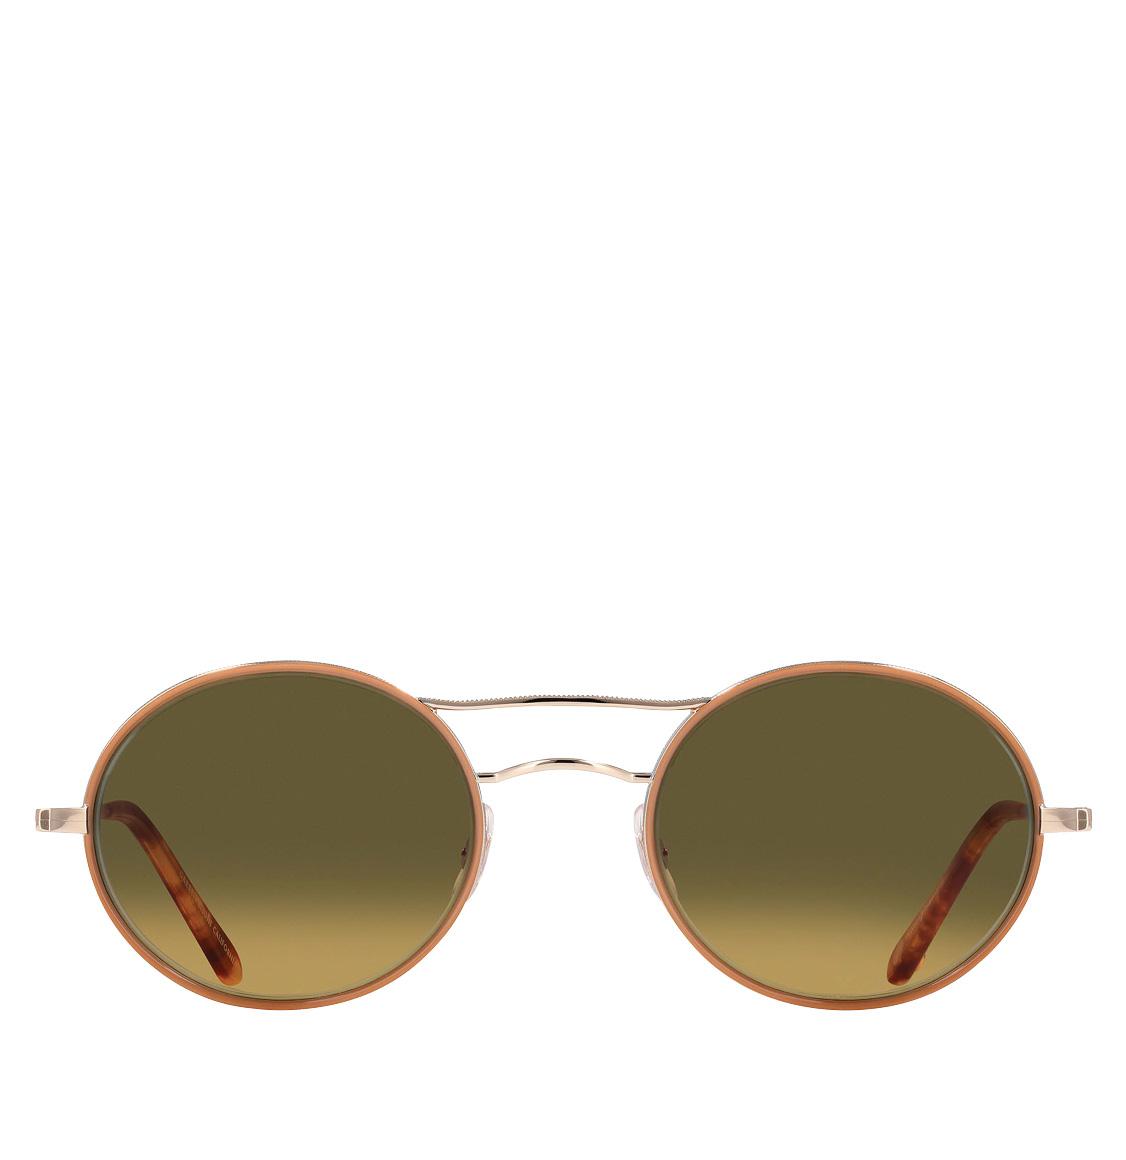 Garrett Leight 4046 Sanborn Sun Camel-Gold 49 Γυαλιά Ηλίου